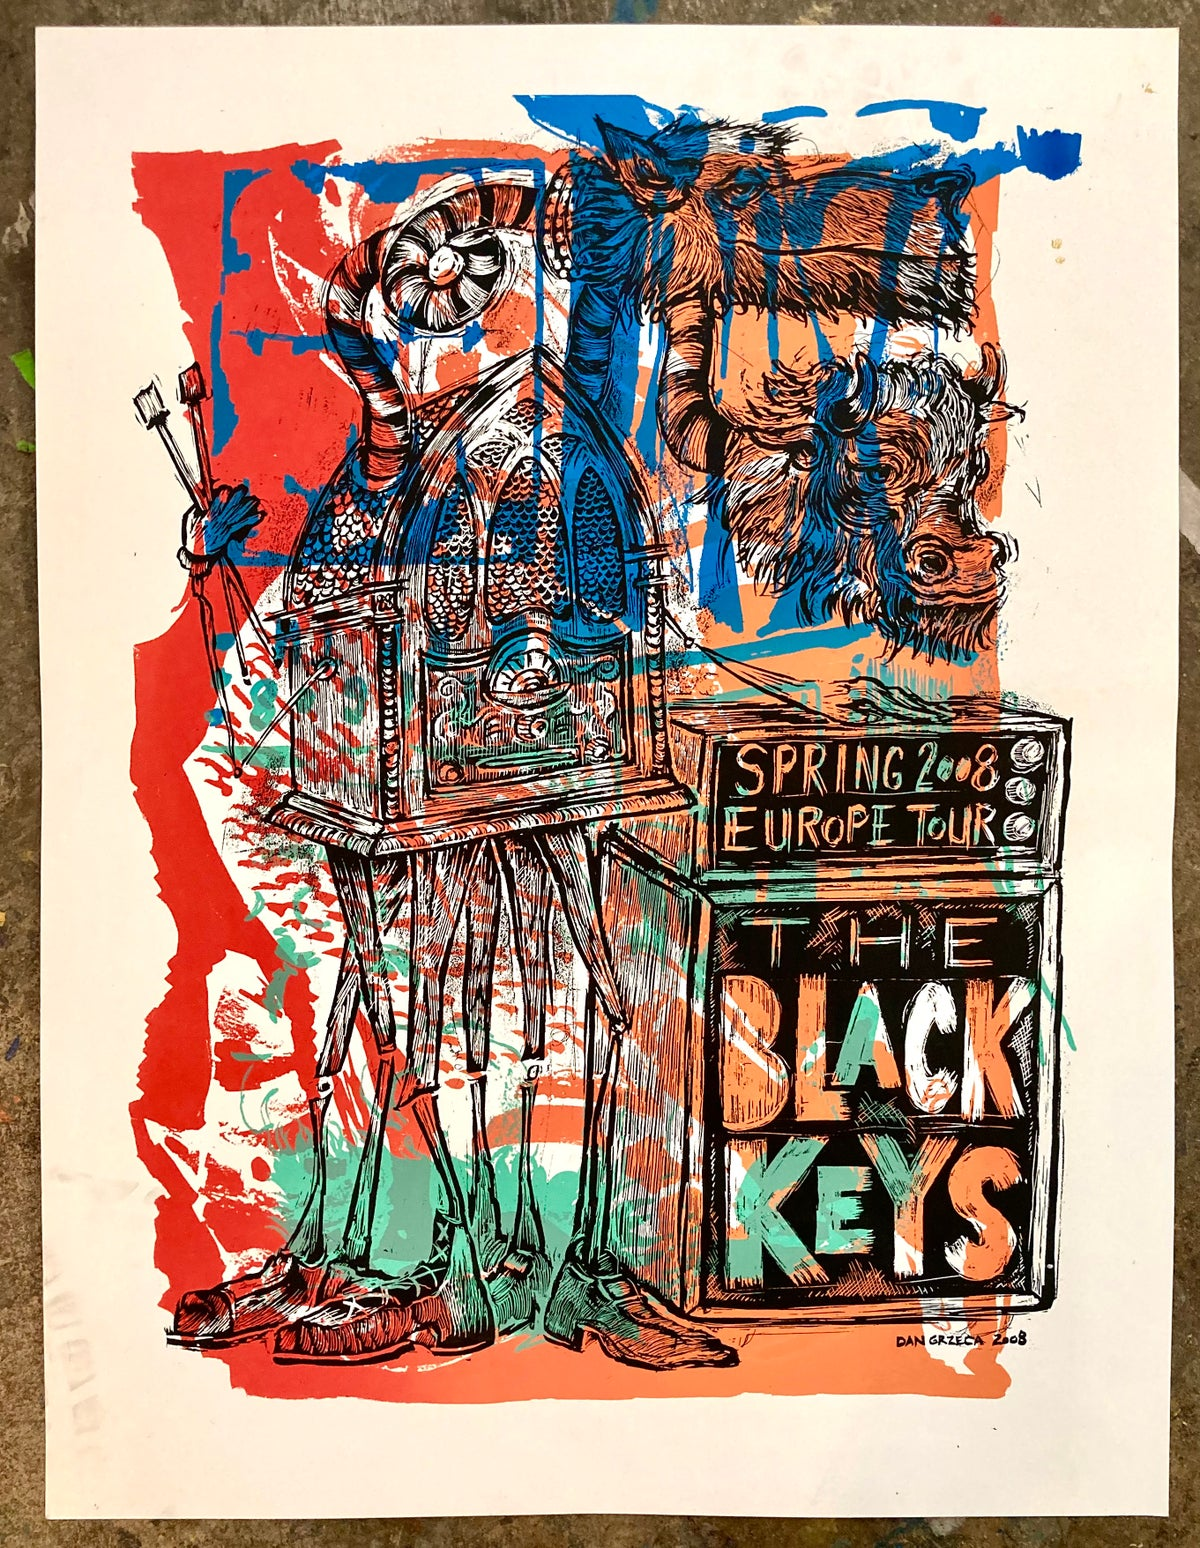 Test Print Black Keys H